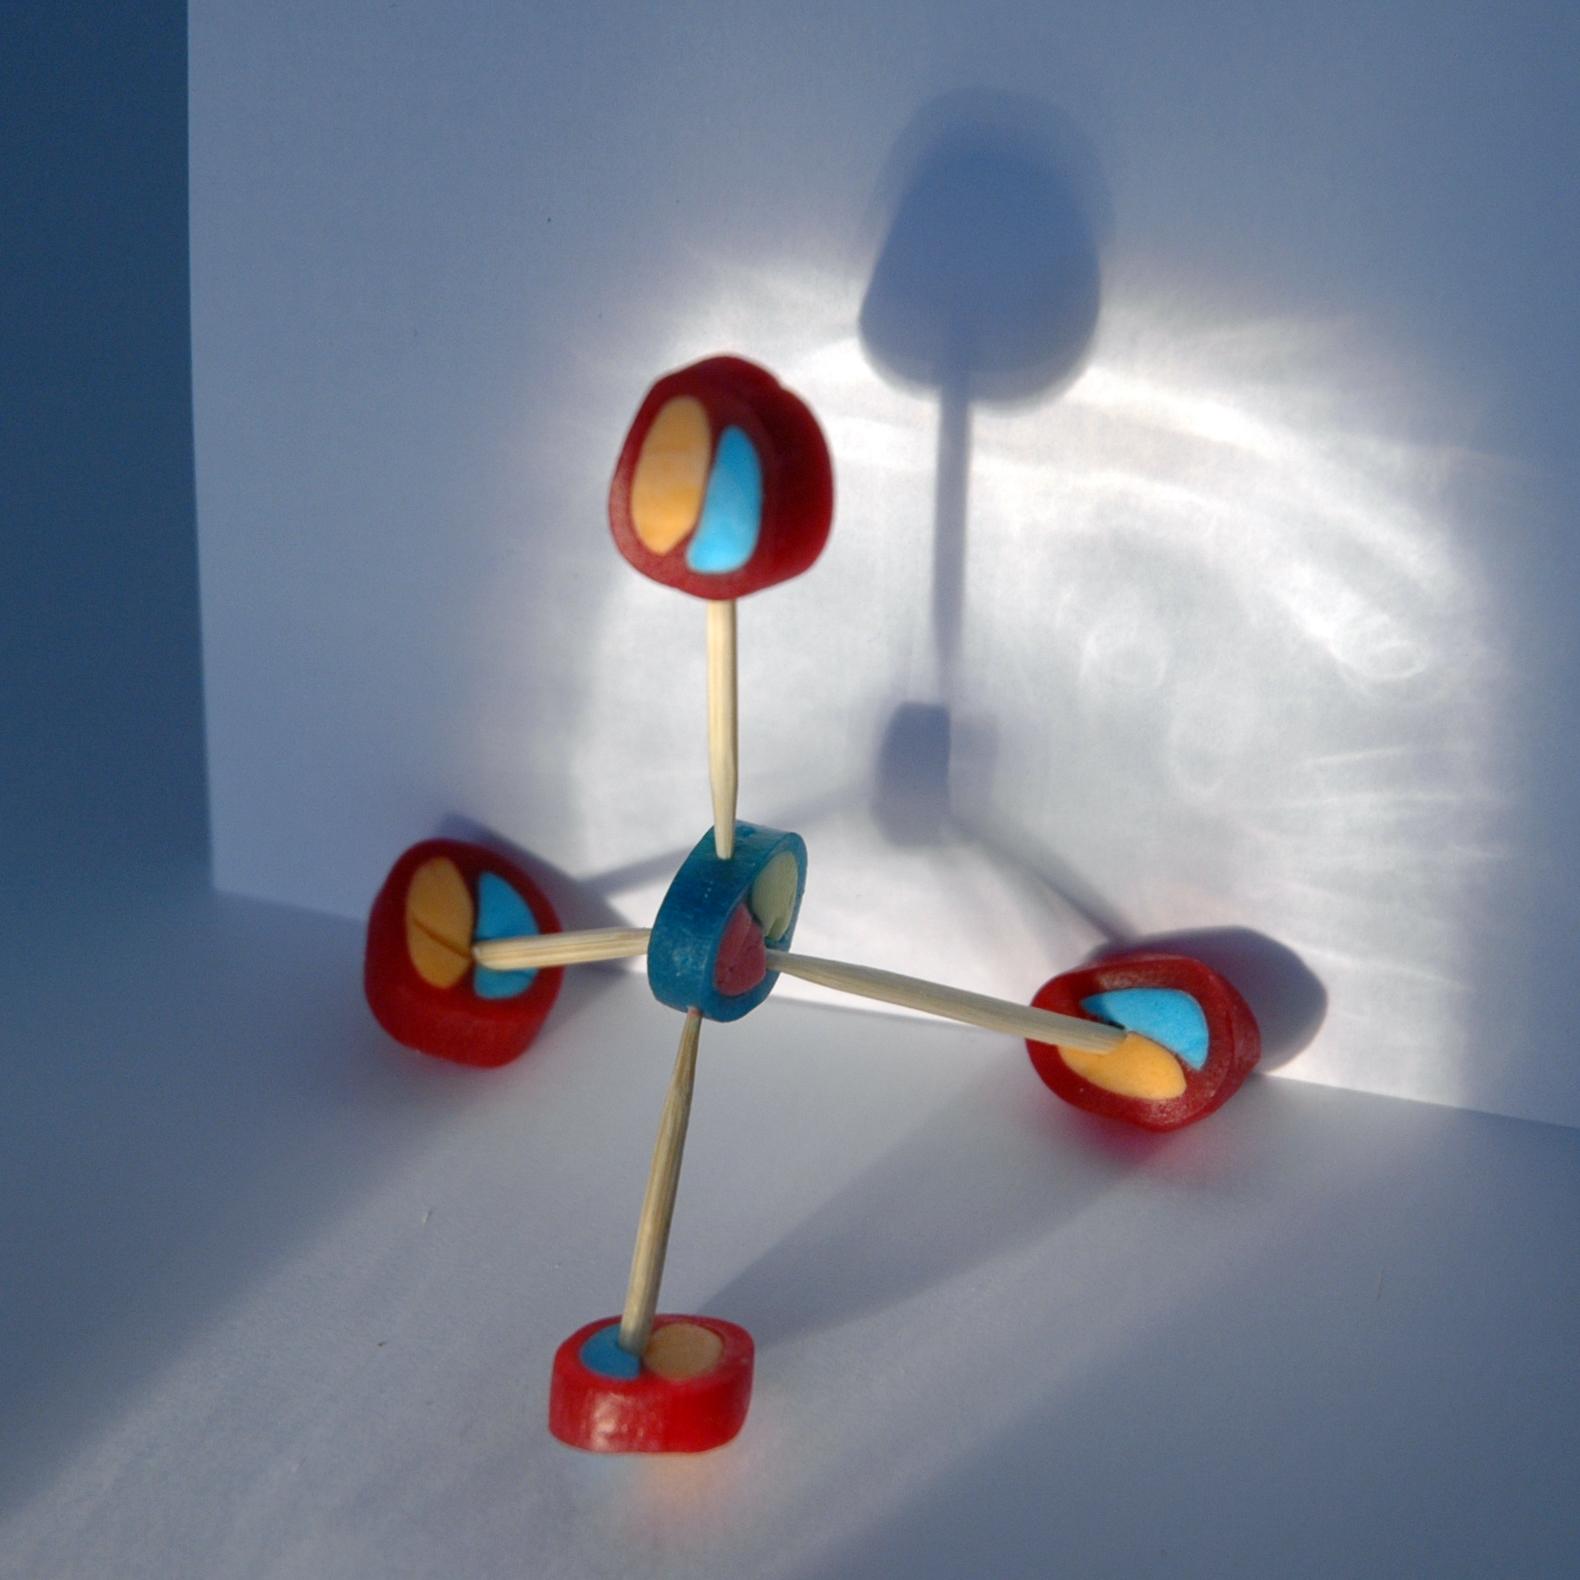 Molekülmodelle mit Sauren Drops